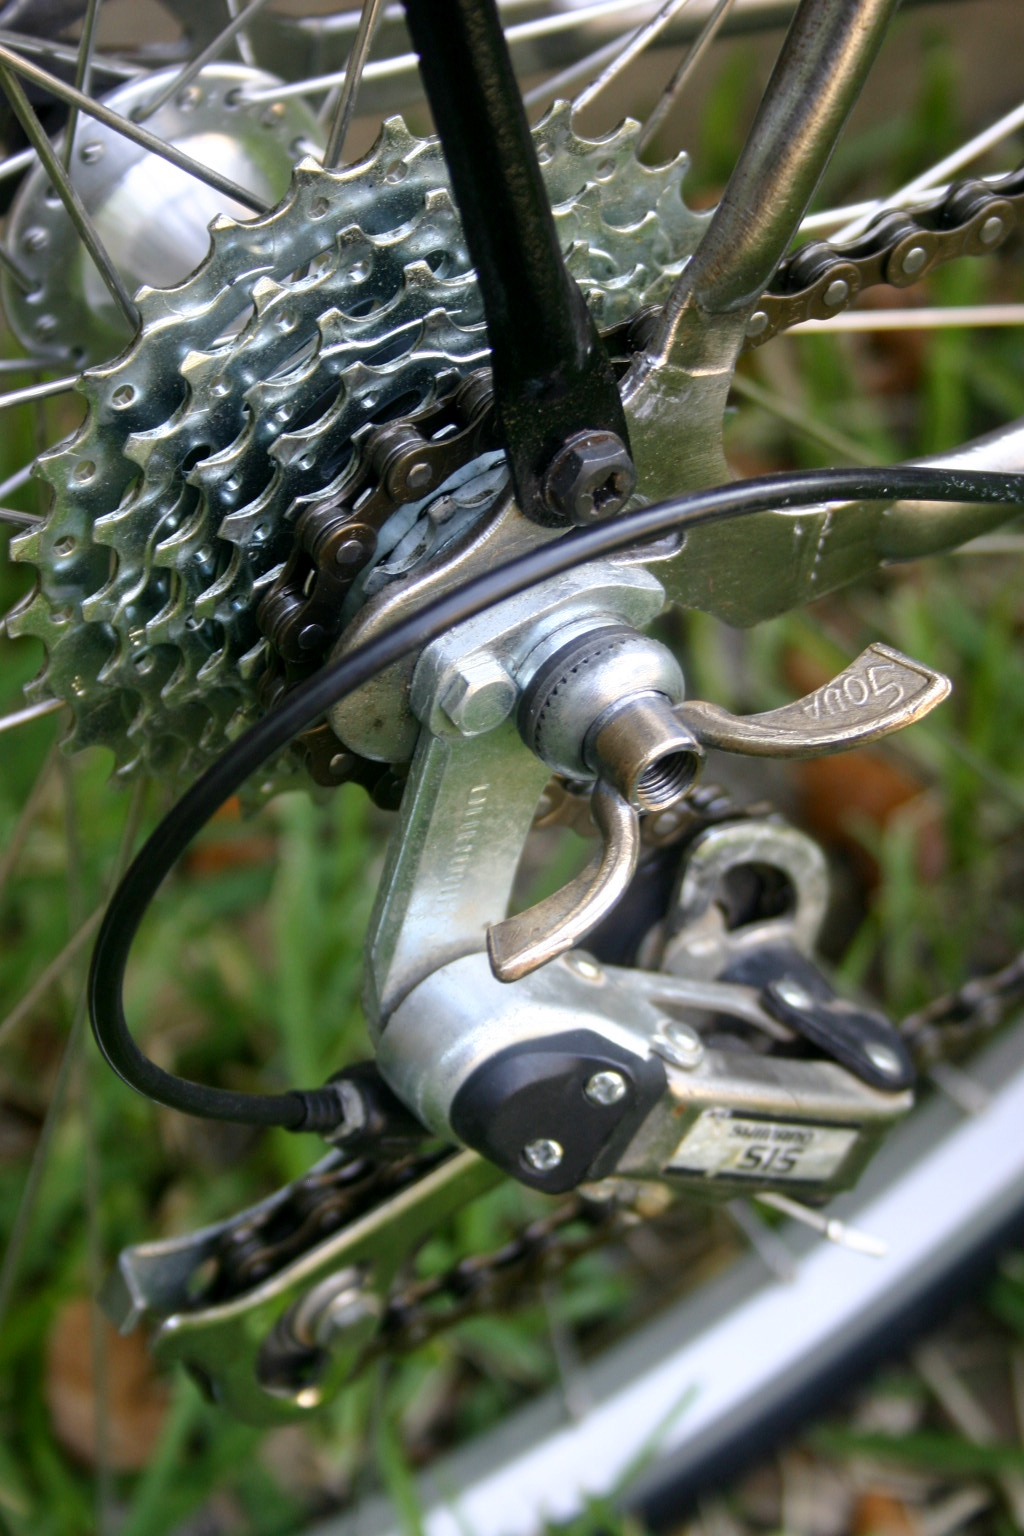 "<img src=""filename.gif"" alt=""Puch Bergmeister rear 7 speed freewheel"">"